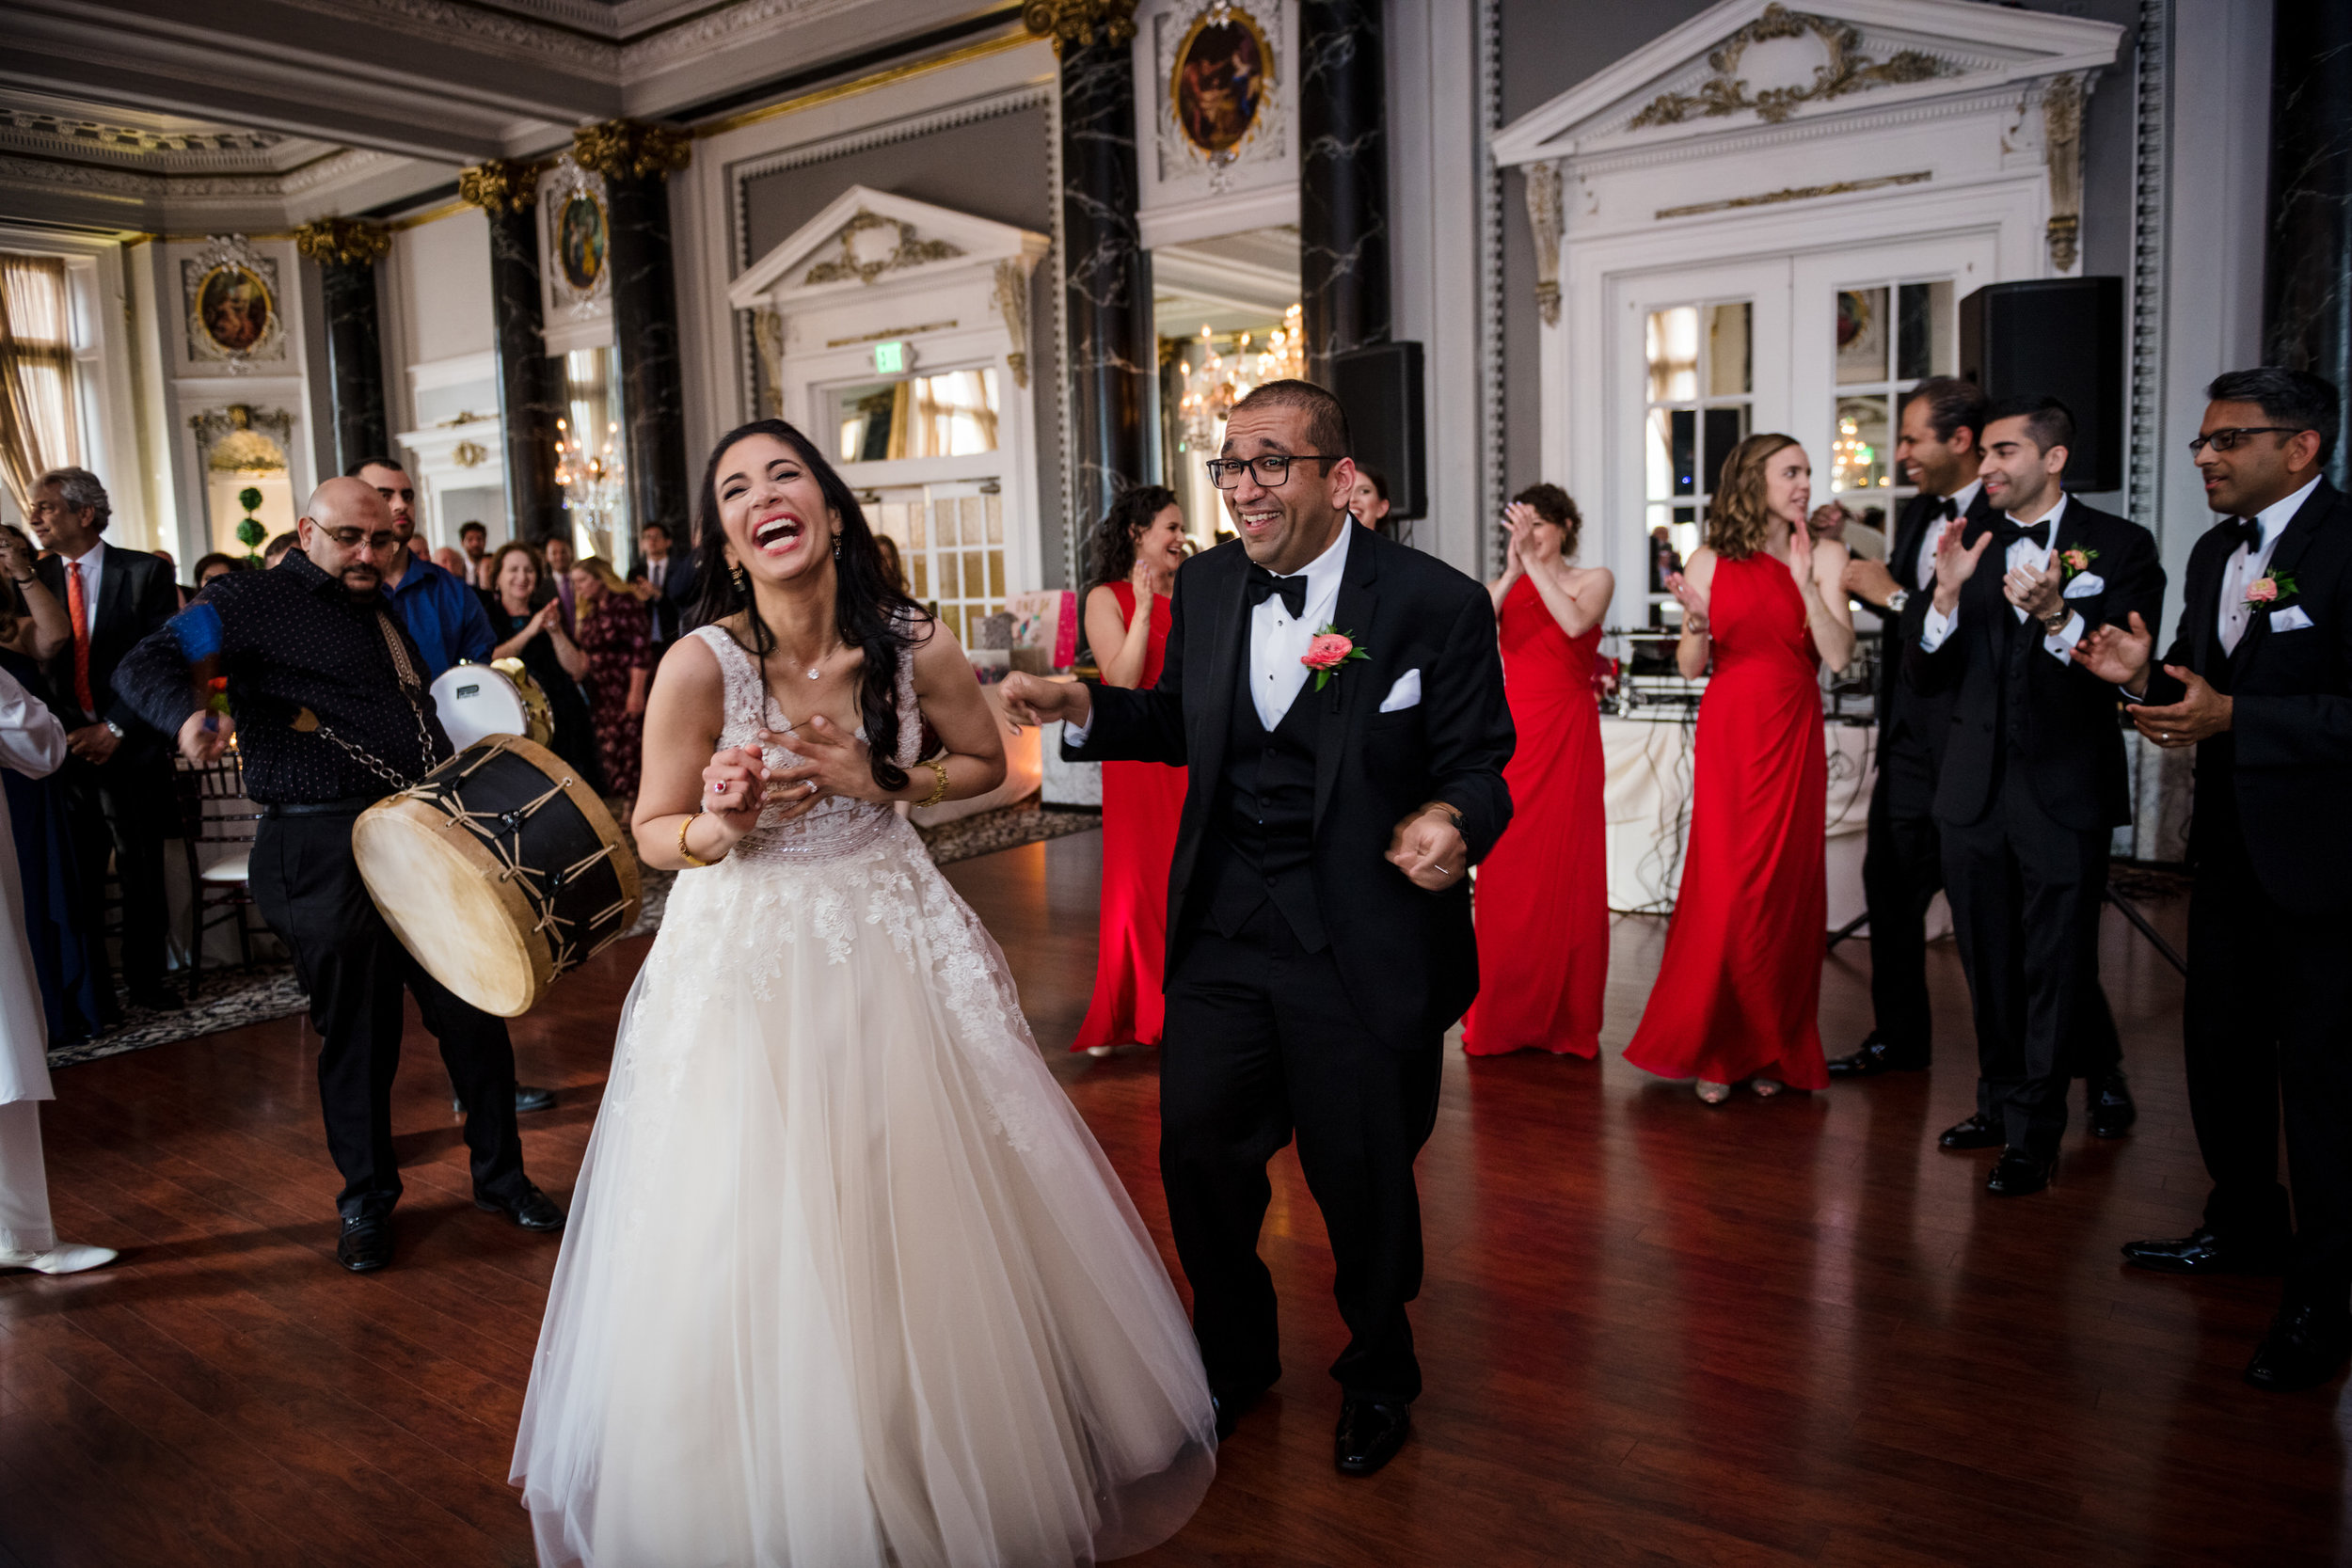 BaltimoreBelvedereWedding-Saniha&Mo-Reception-5747.jpg